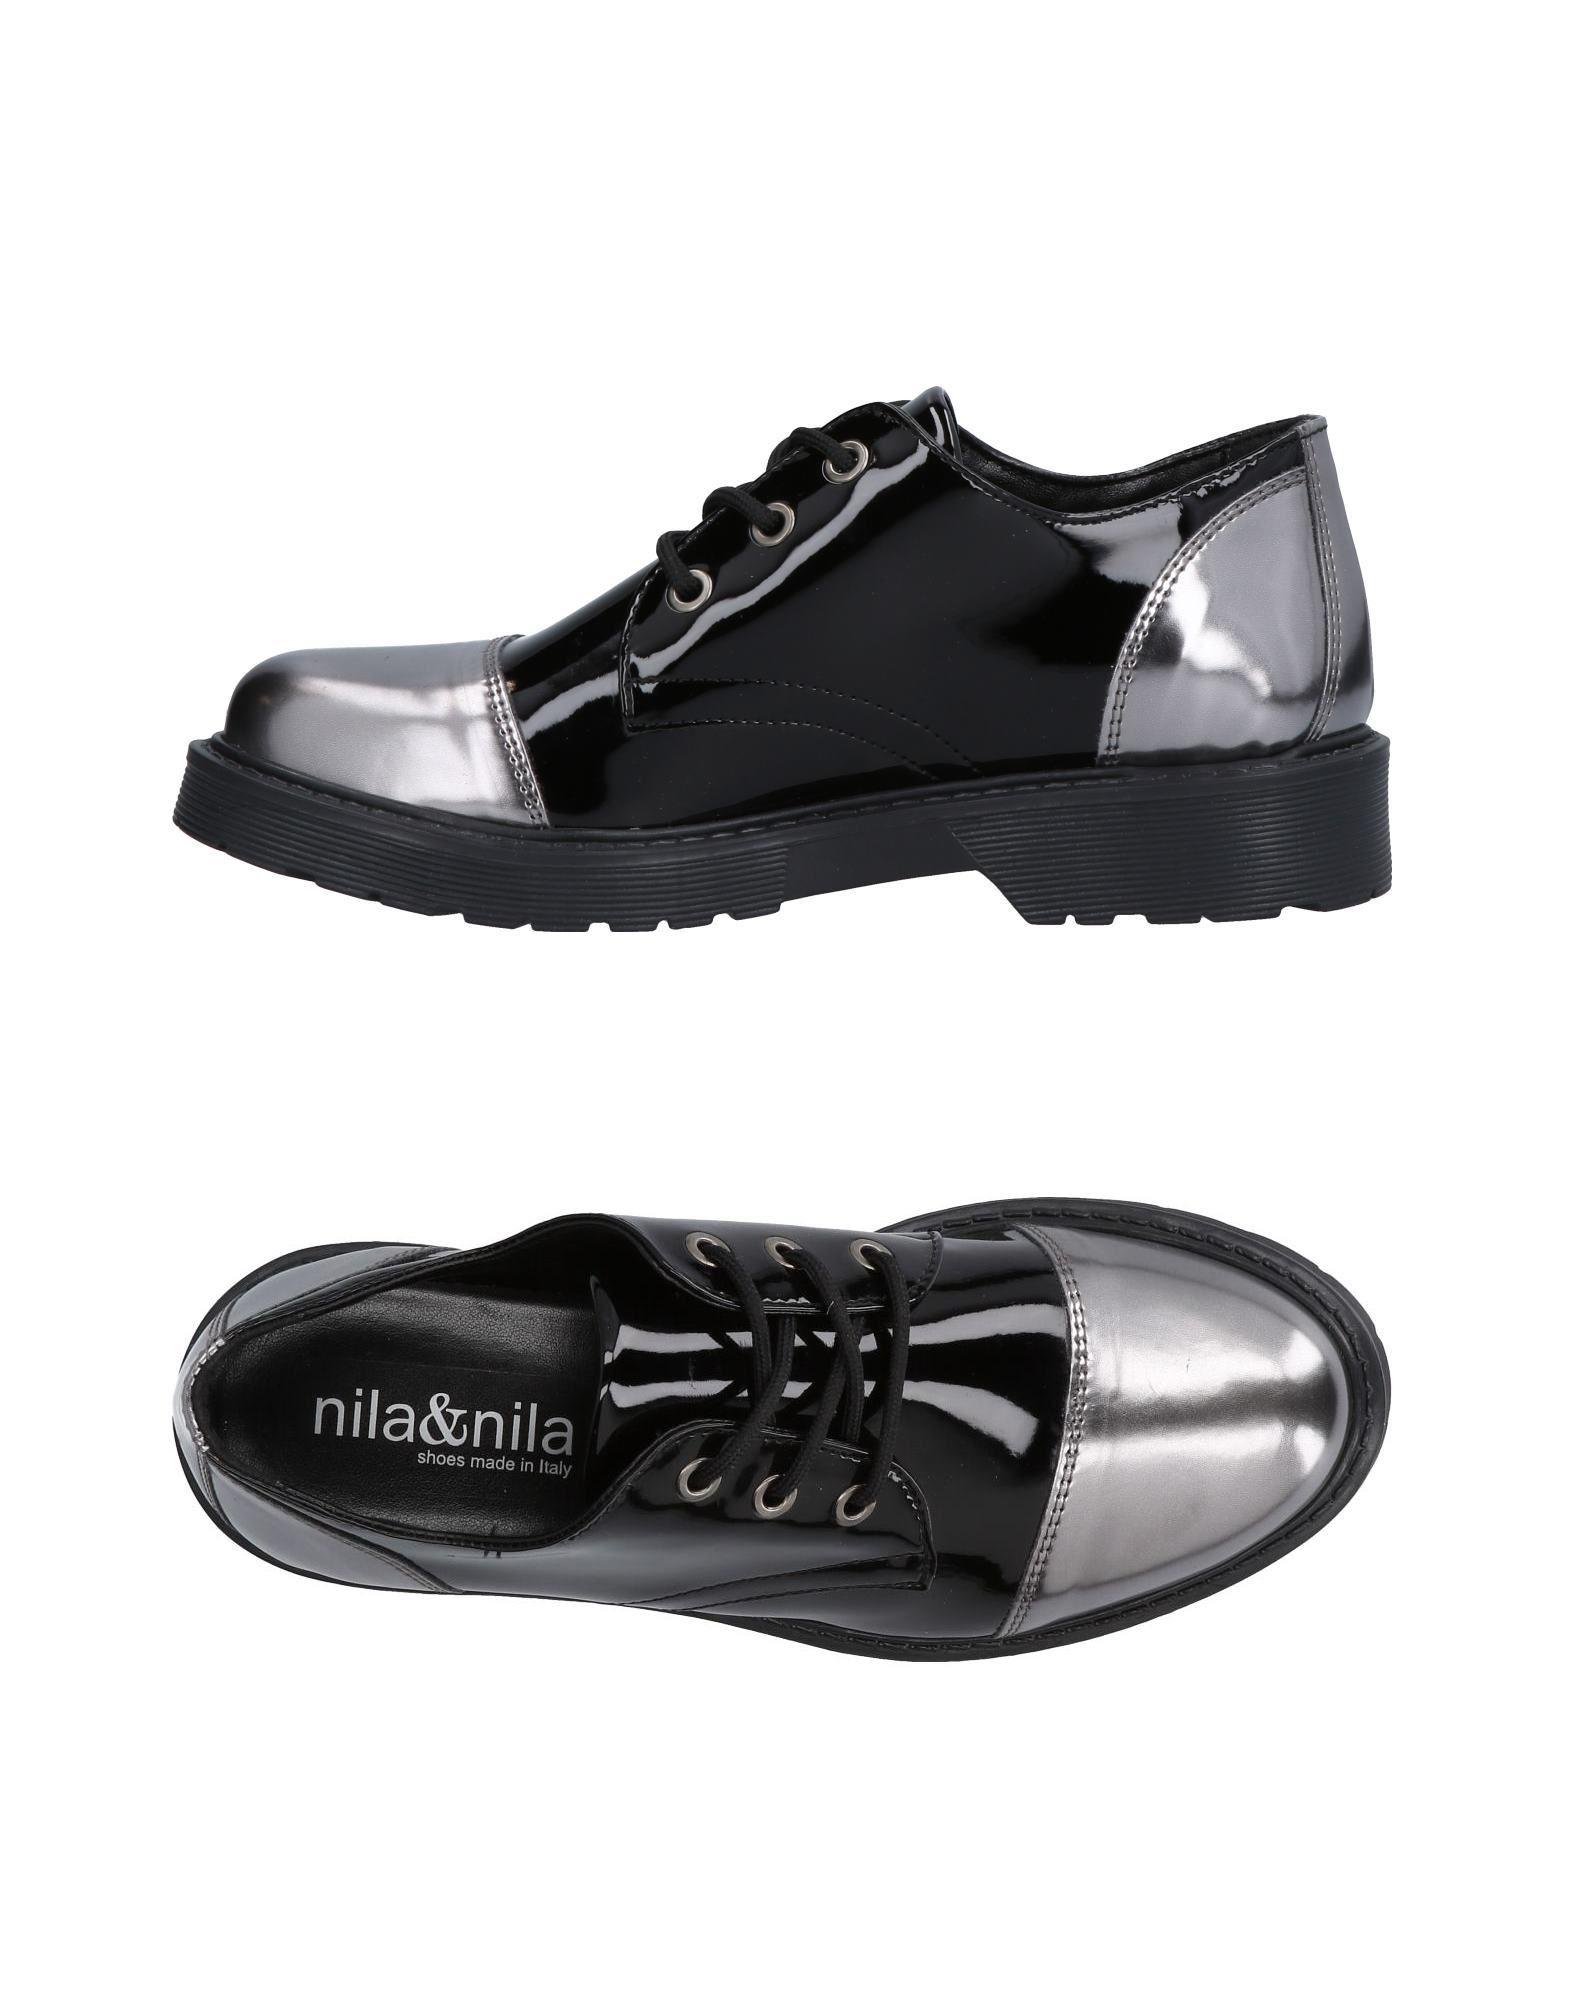 Nila Damen & Nila Schnürschuhe Damen Nila  11475011DH Neue Schuhe 29308f